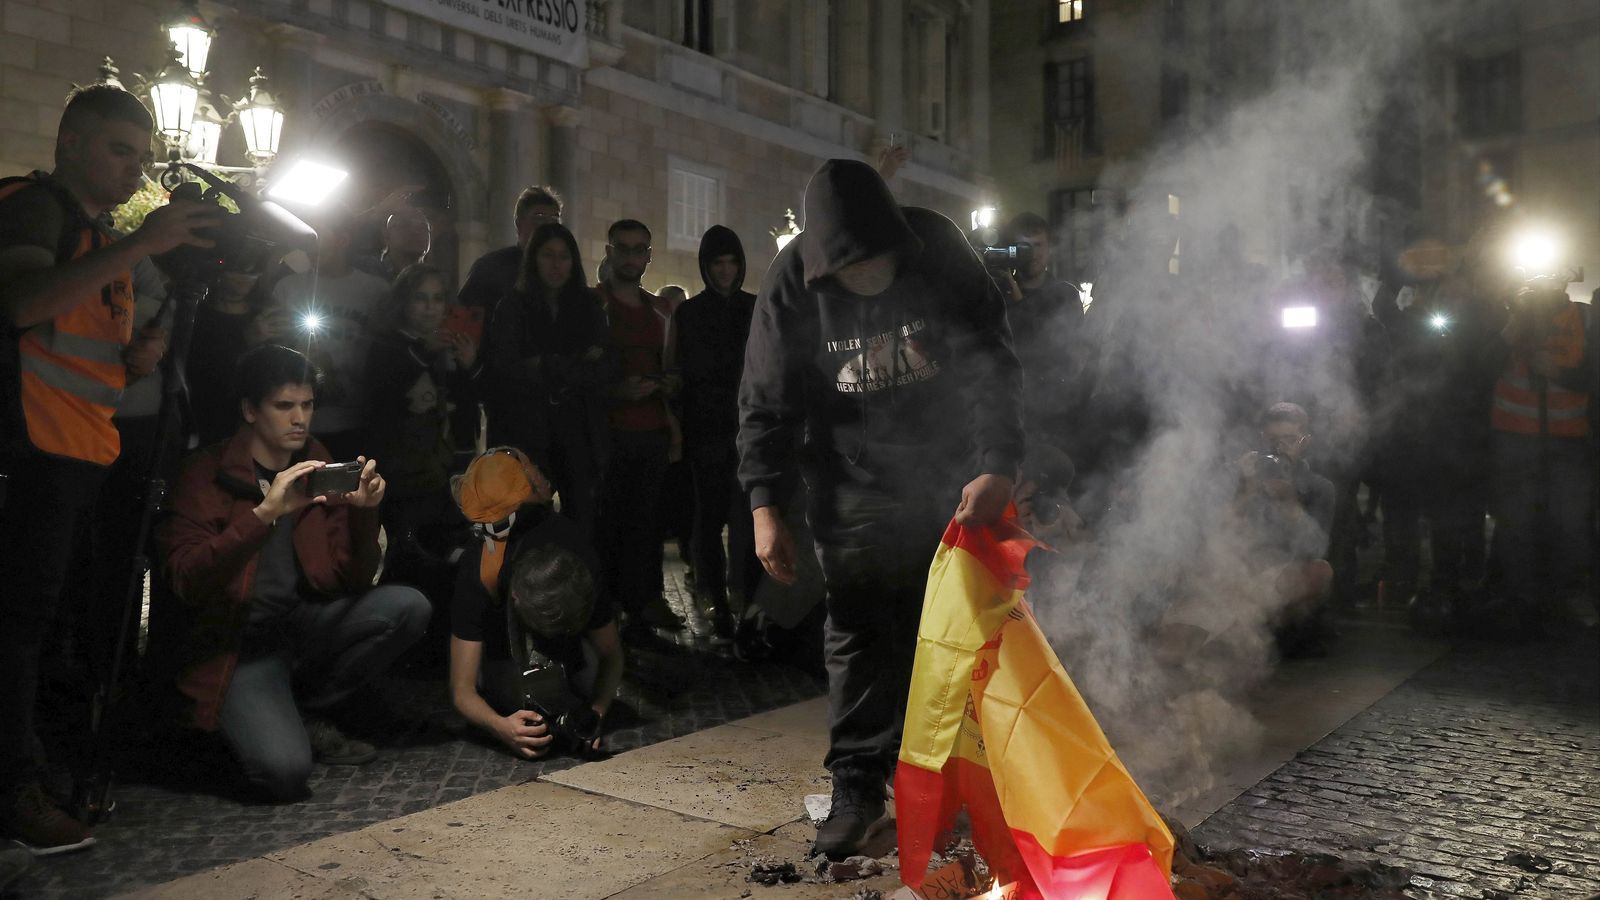 Un manifestante quema una bandera española en una protesta a laPlaça Sant Jaume de Barcelona / ANDREU DALMAU / EFE